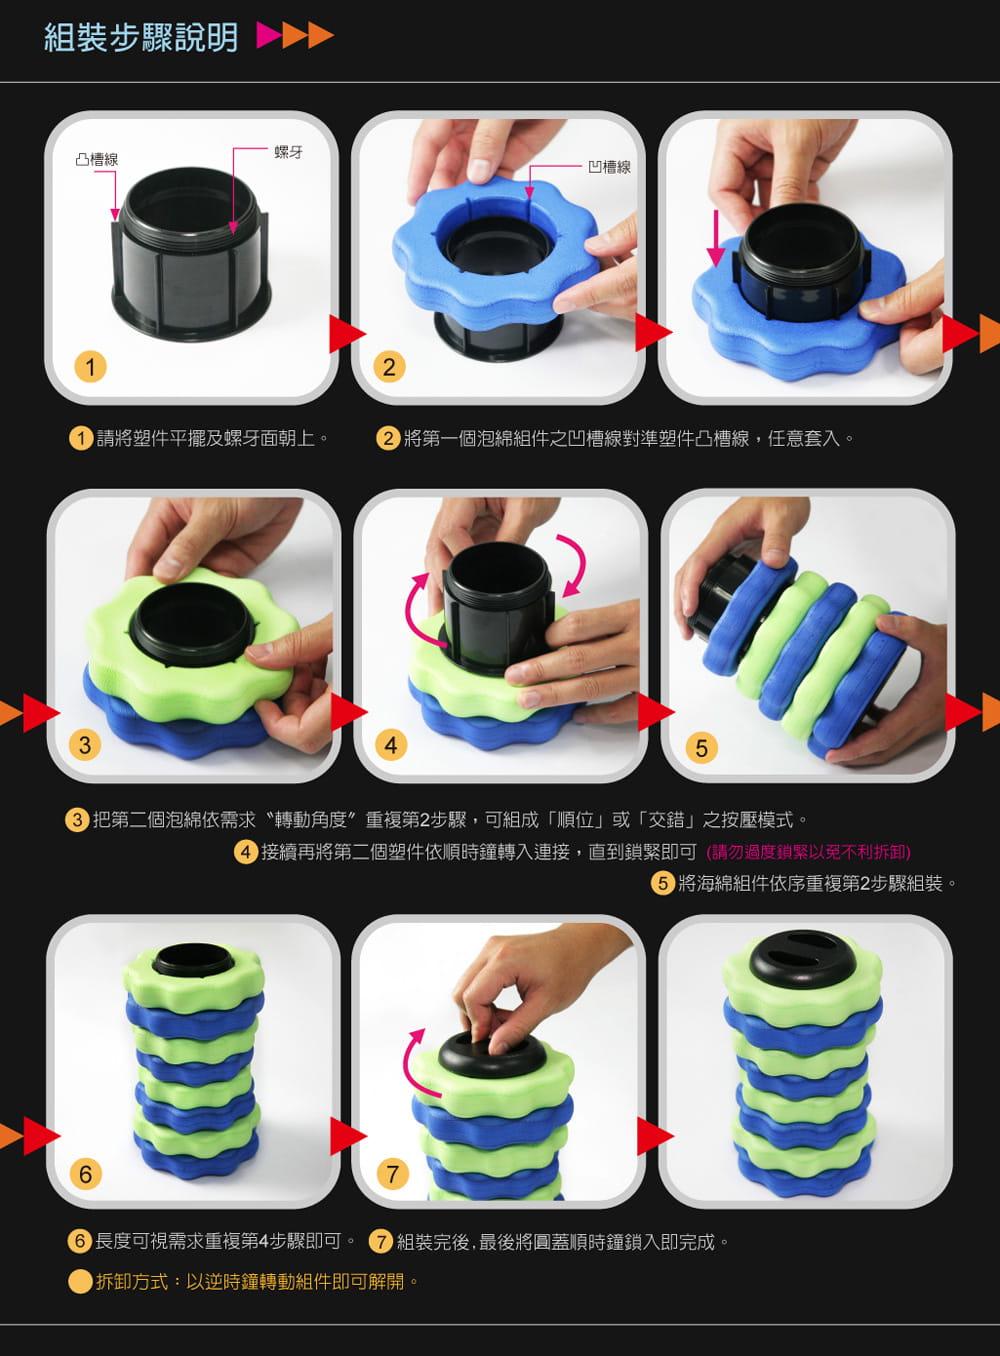 U-roller瑜伽滾輪 長版48公分【黑色硬版】 4